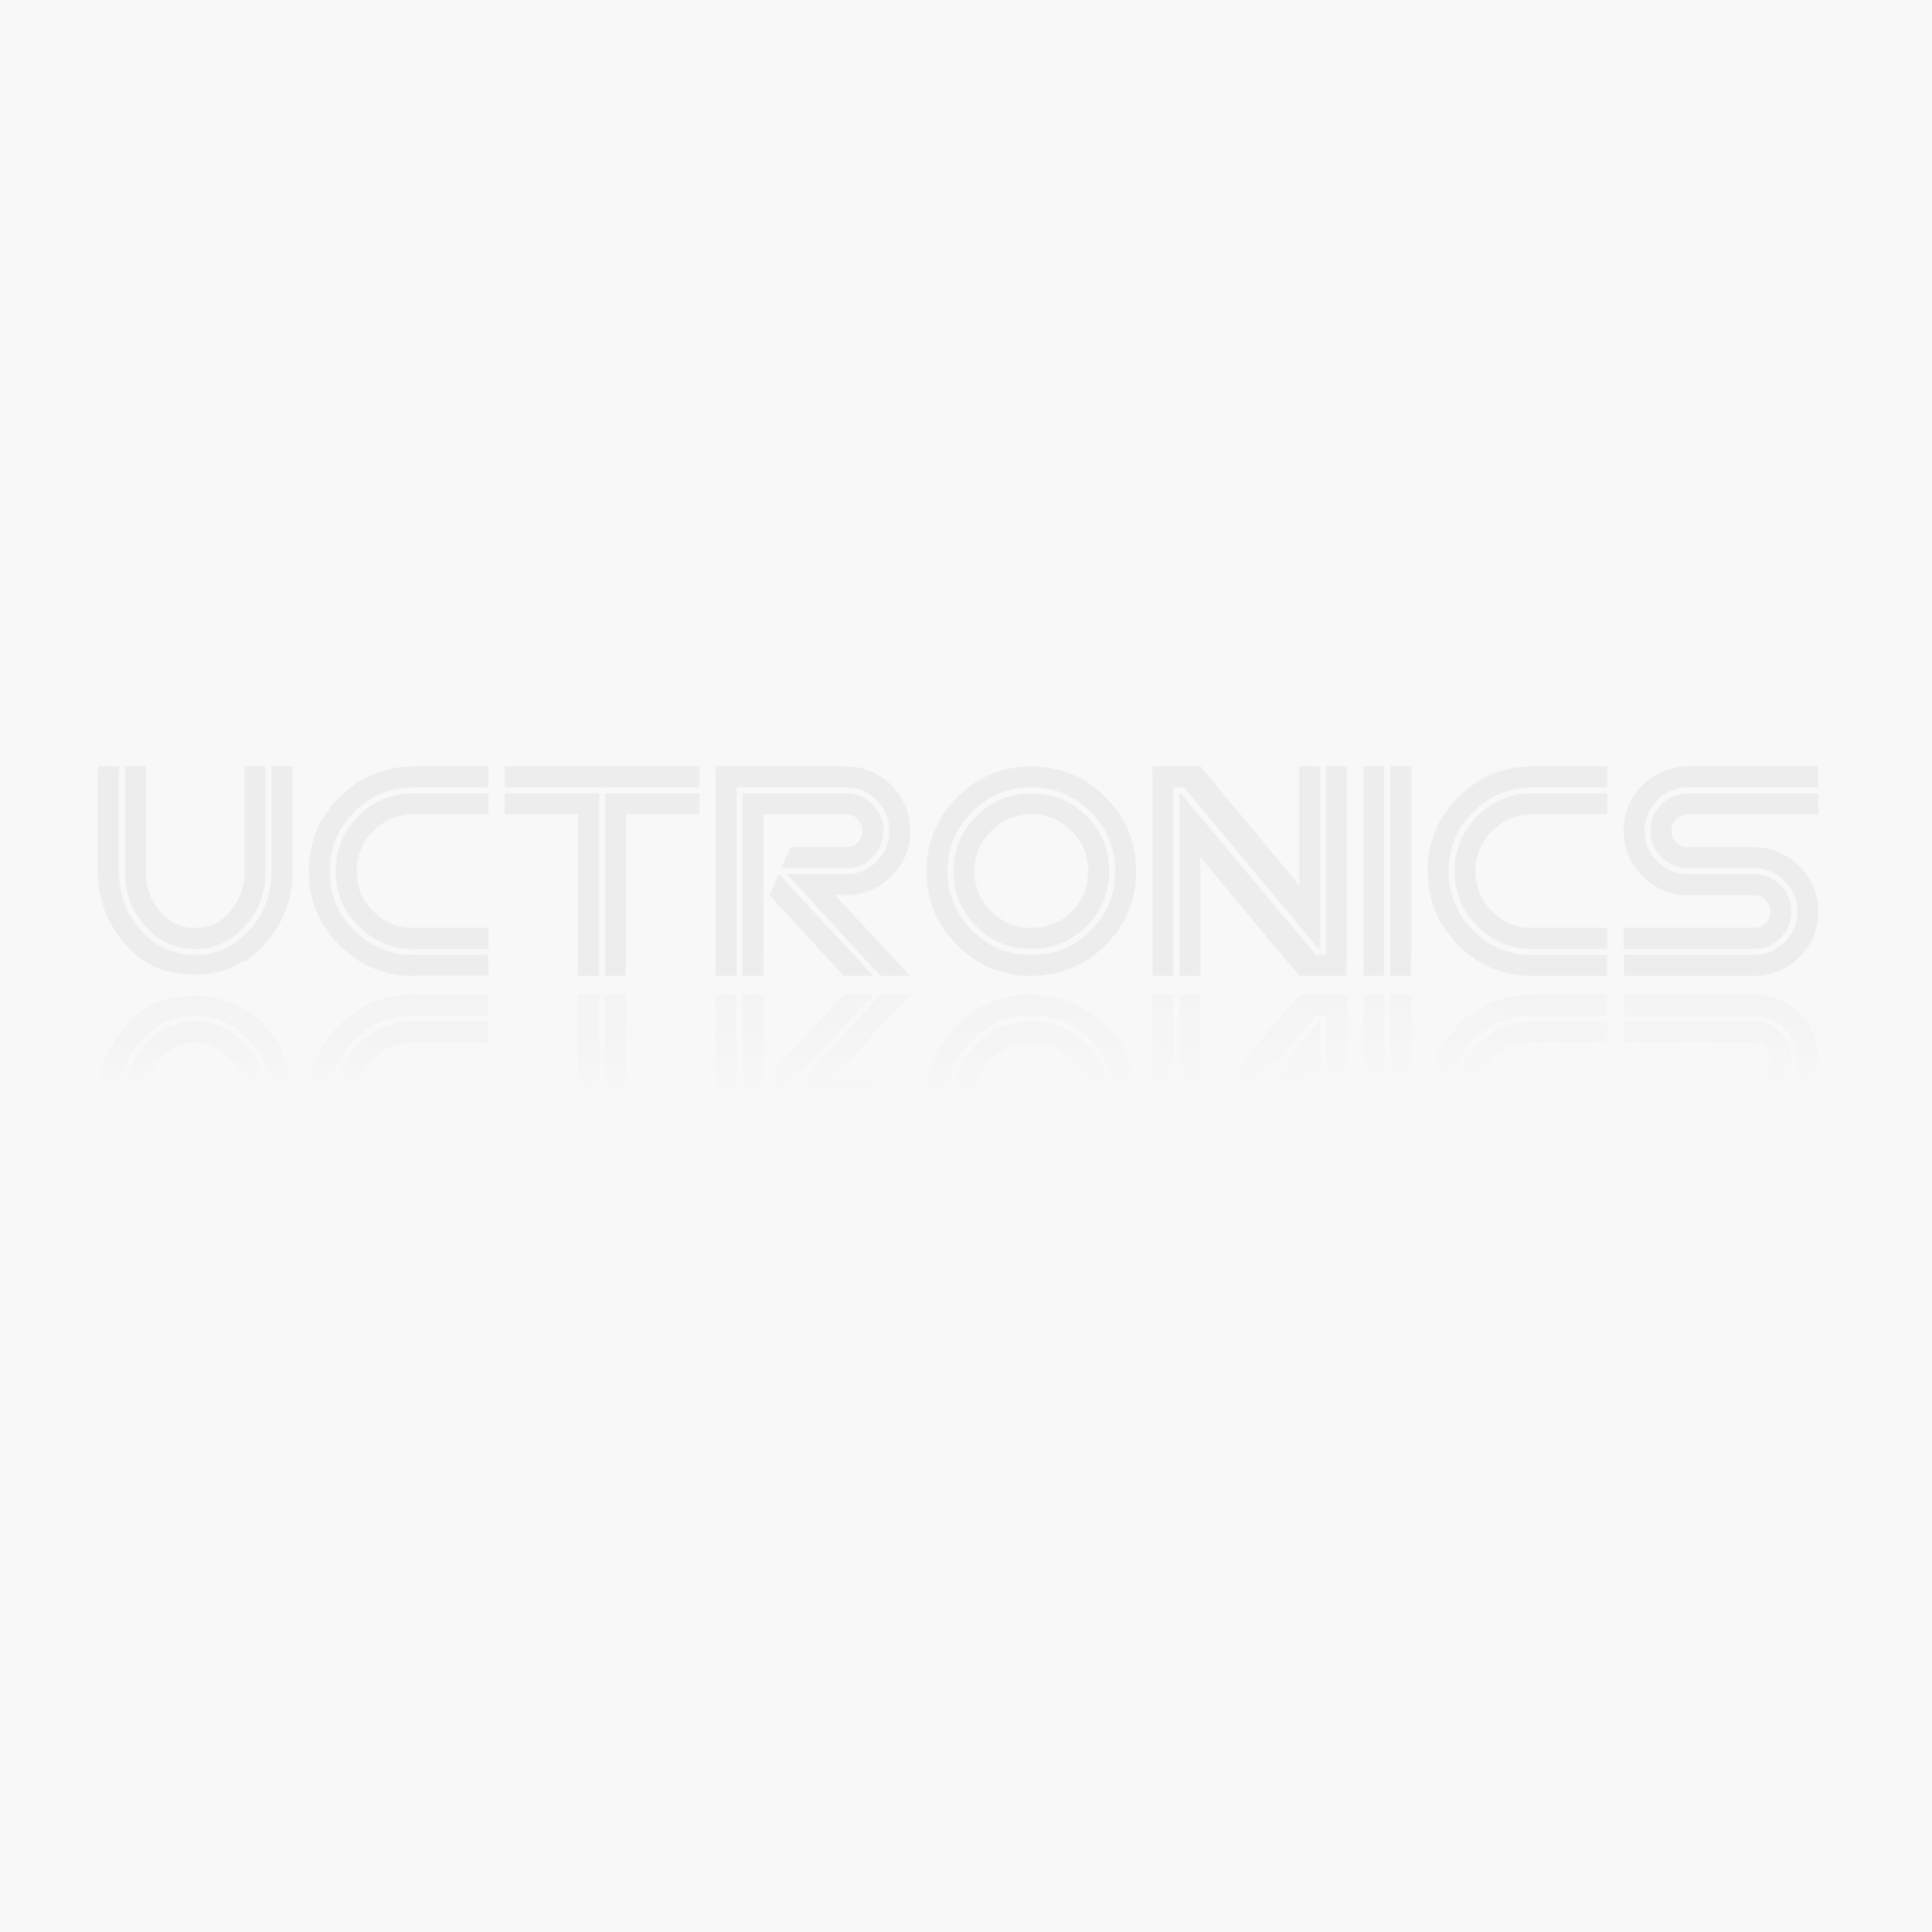 D52-2048 AC200-450V AC0-100.0A LCD Digitial Multi Meter Voltmeter Ammeter